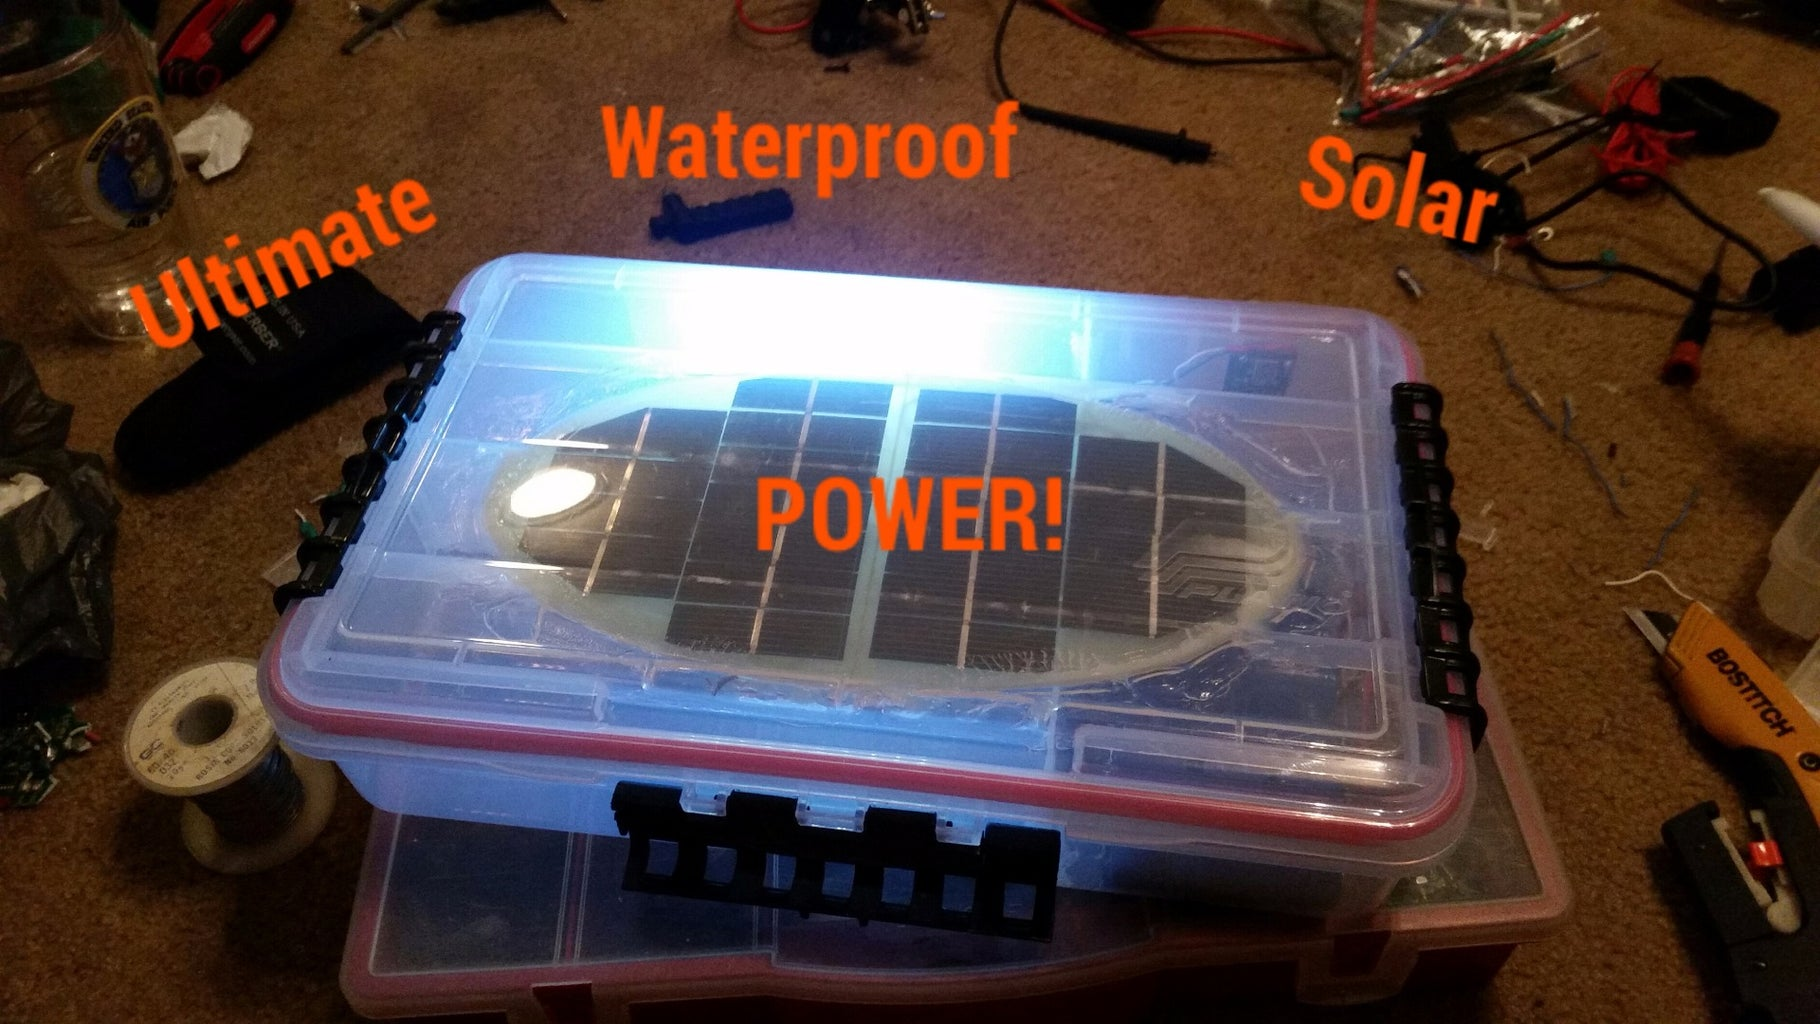 Ultimate Waterproof Solar Power